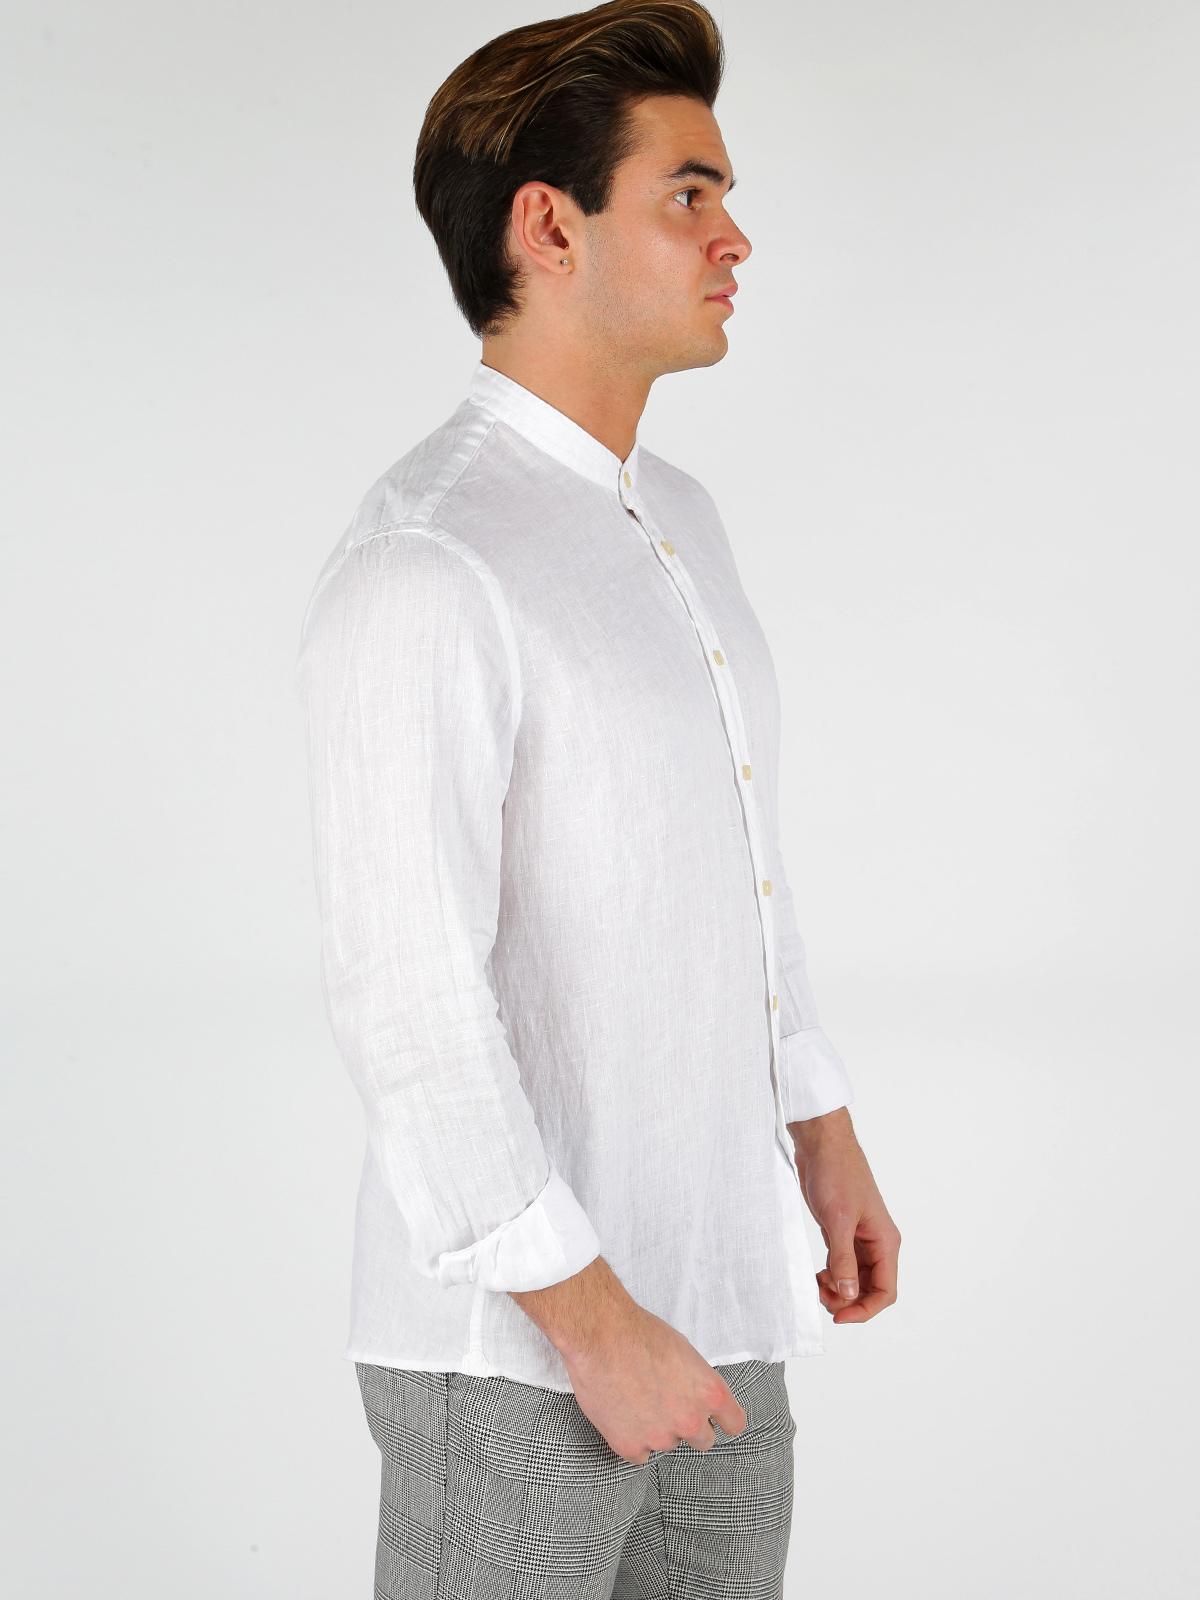 23eada91ce Camicia coreana di lino b-style   MecShopping